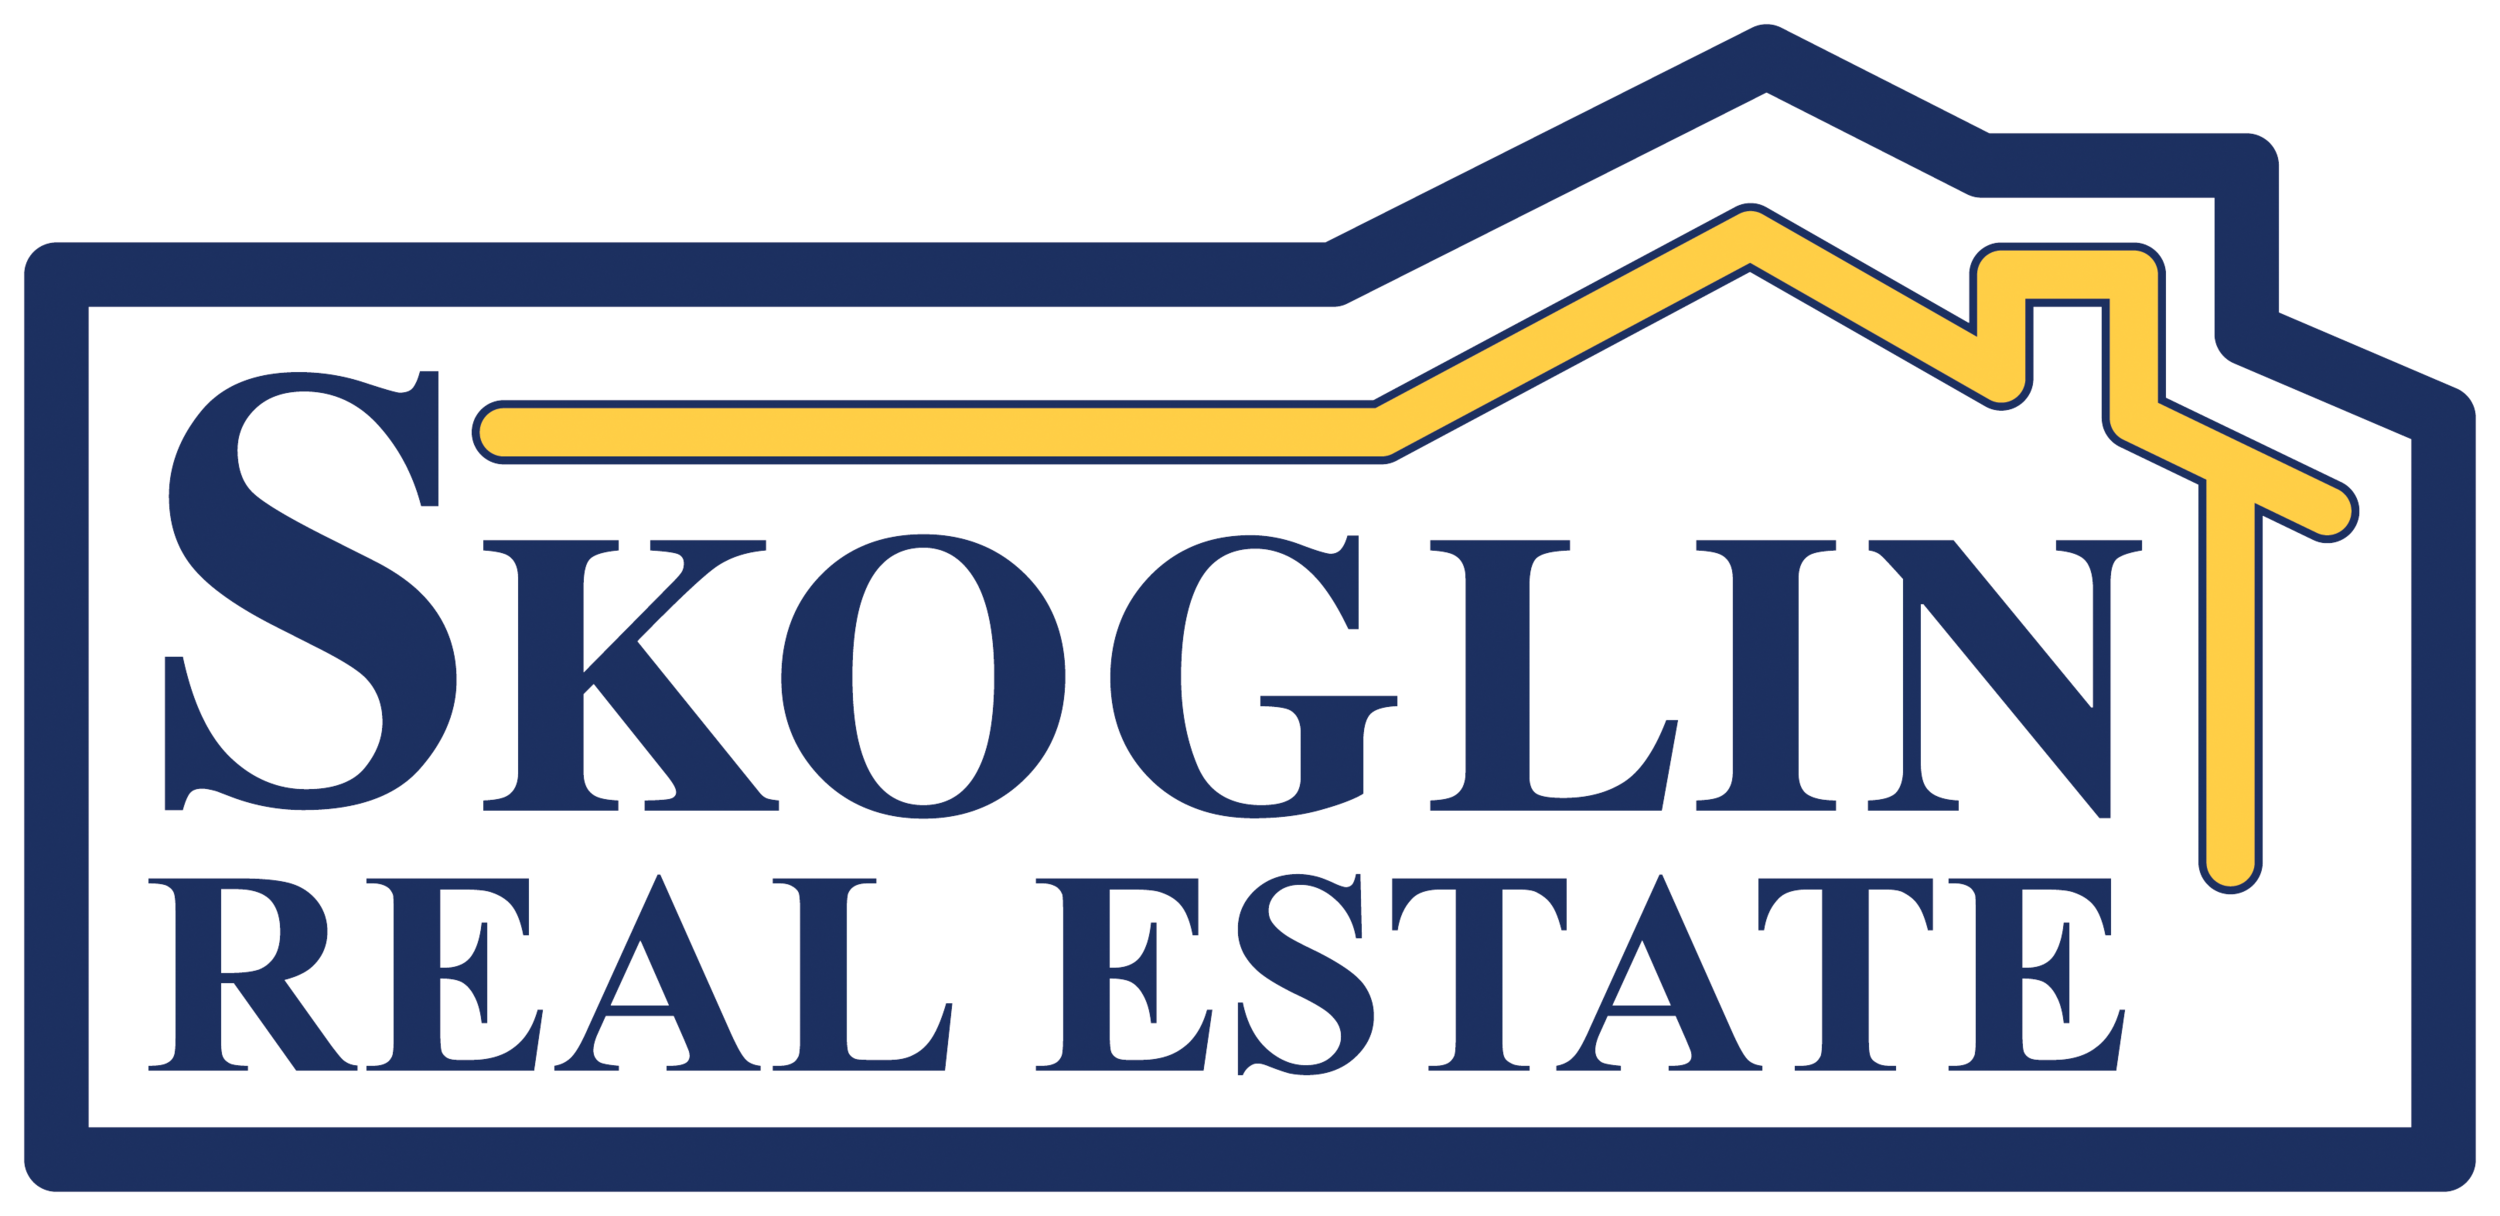 Skoglin Real Estate logo.png